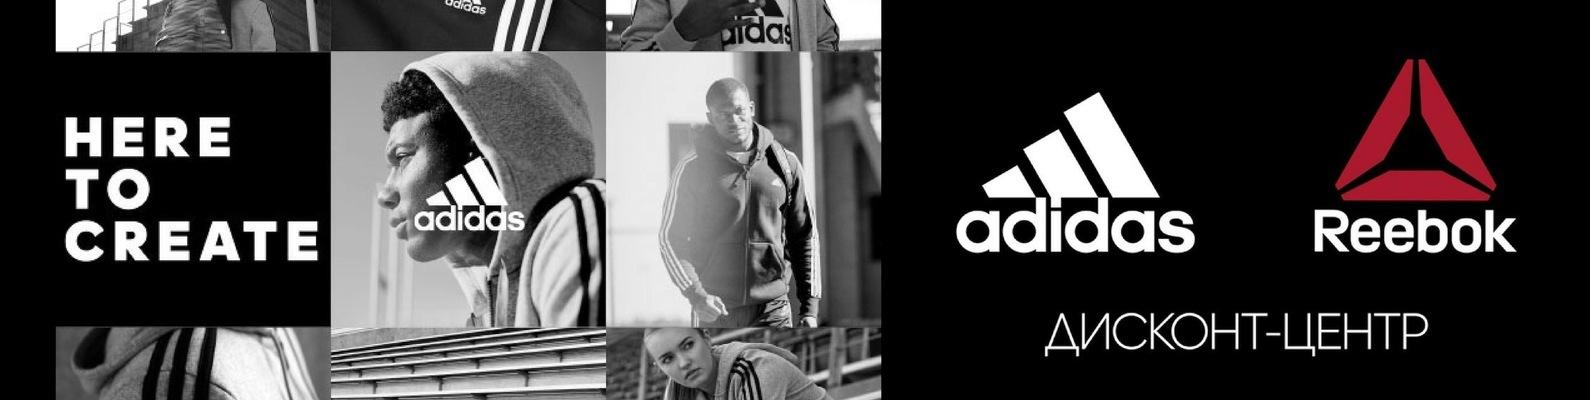 adidas Reebok outlet 2.0 TЦ OMEGA   ВКонтакте bc11f483ab0